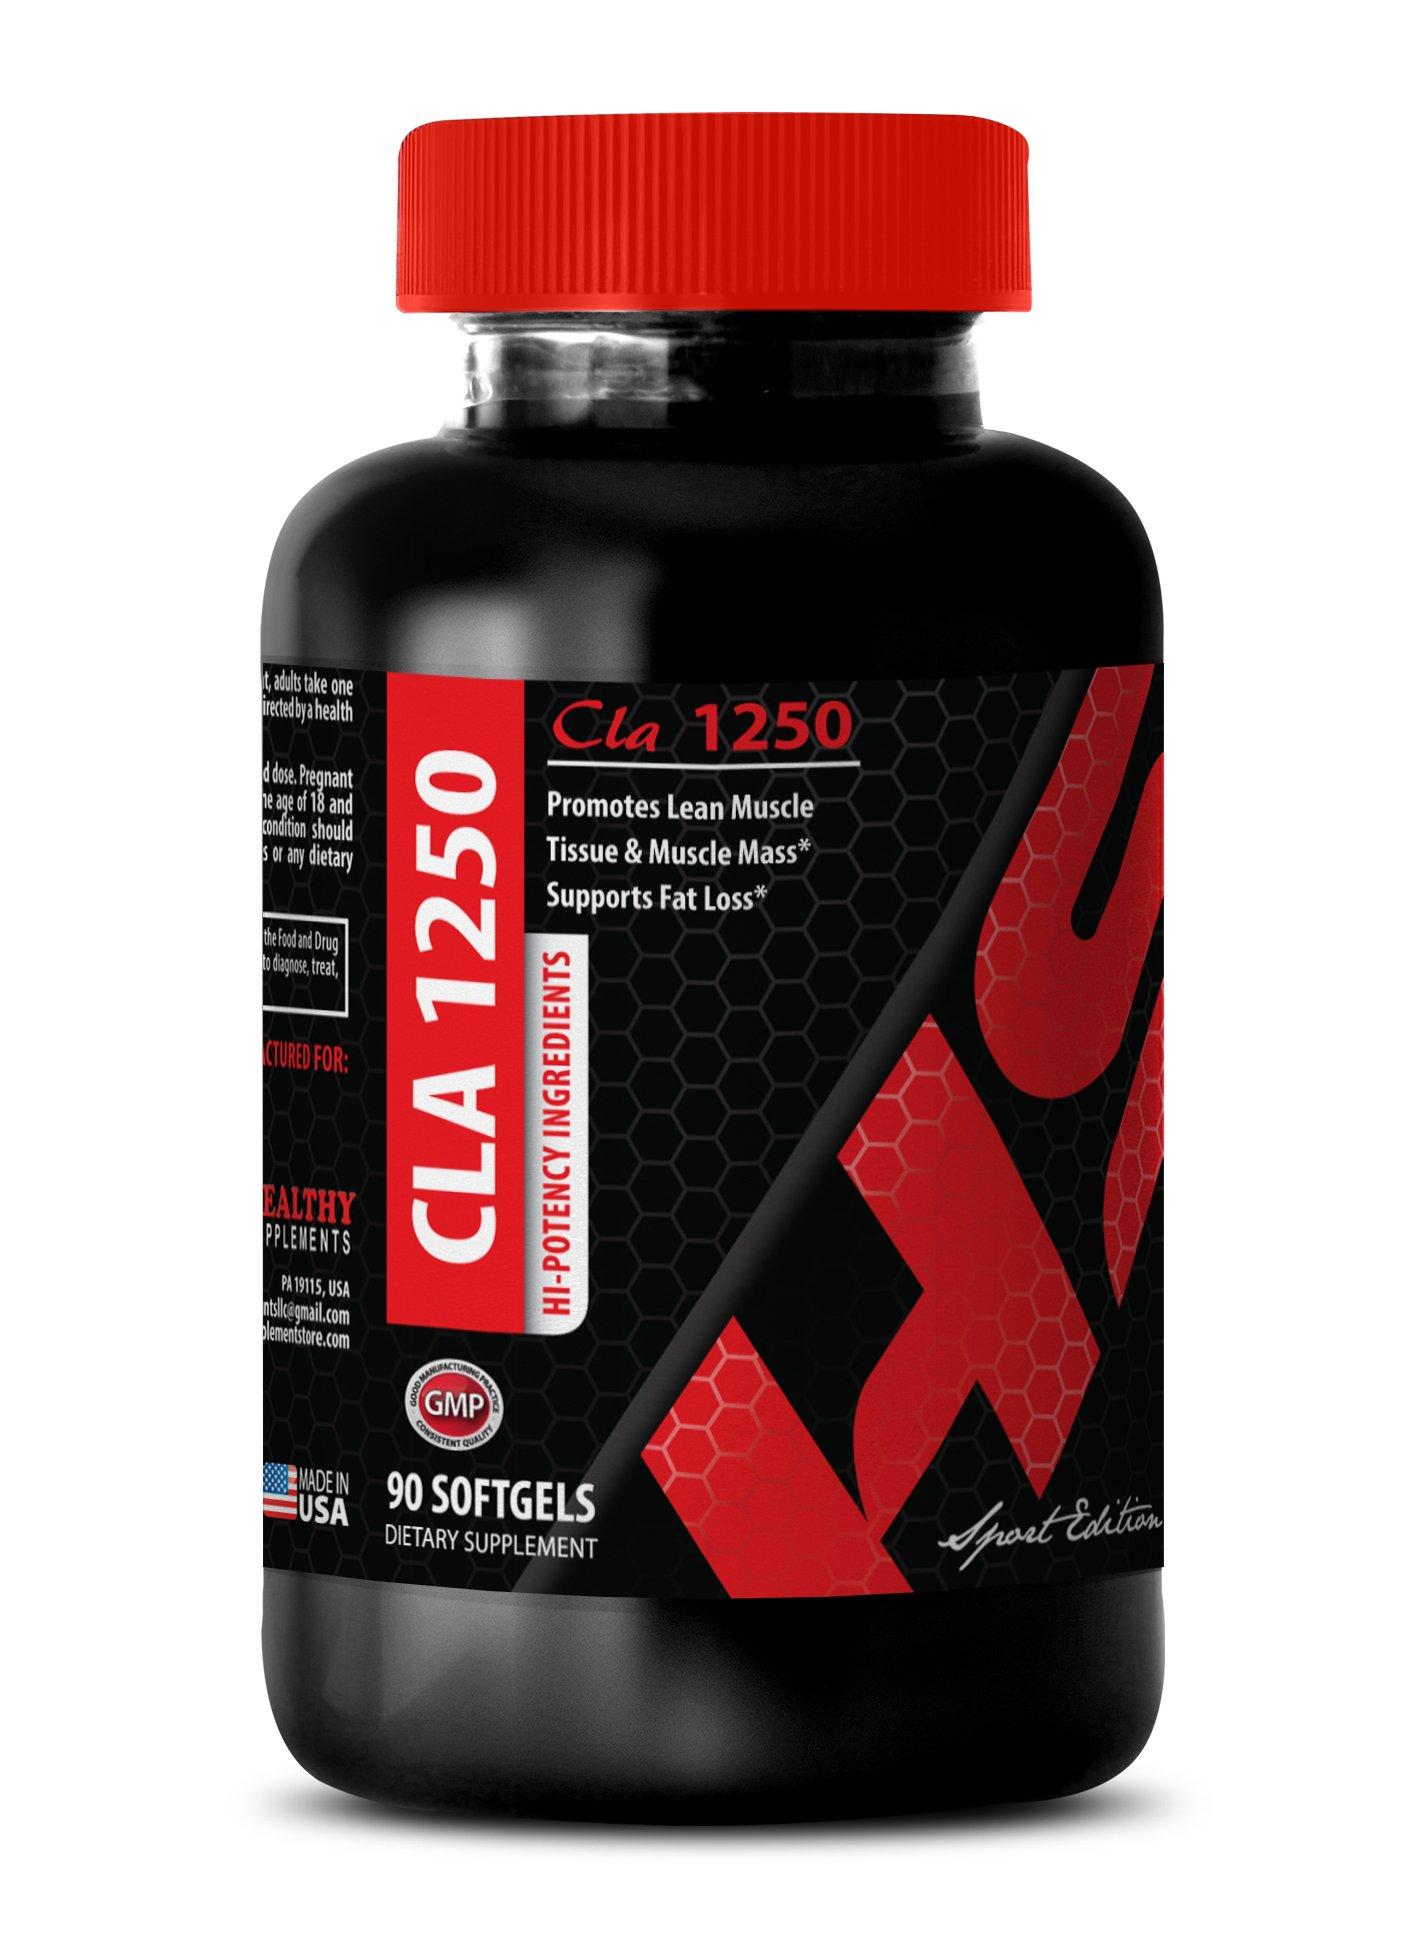 Cla omega 3 6 9 - CONJUGATED LINOLEIC ACID CLA 1250 MG - increase energy (1 Bottle)